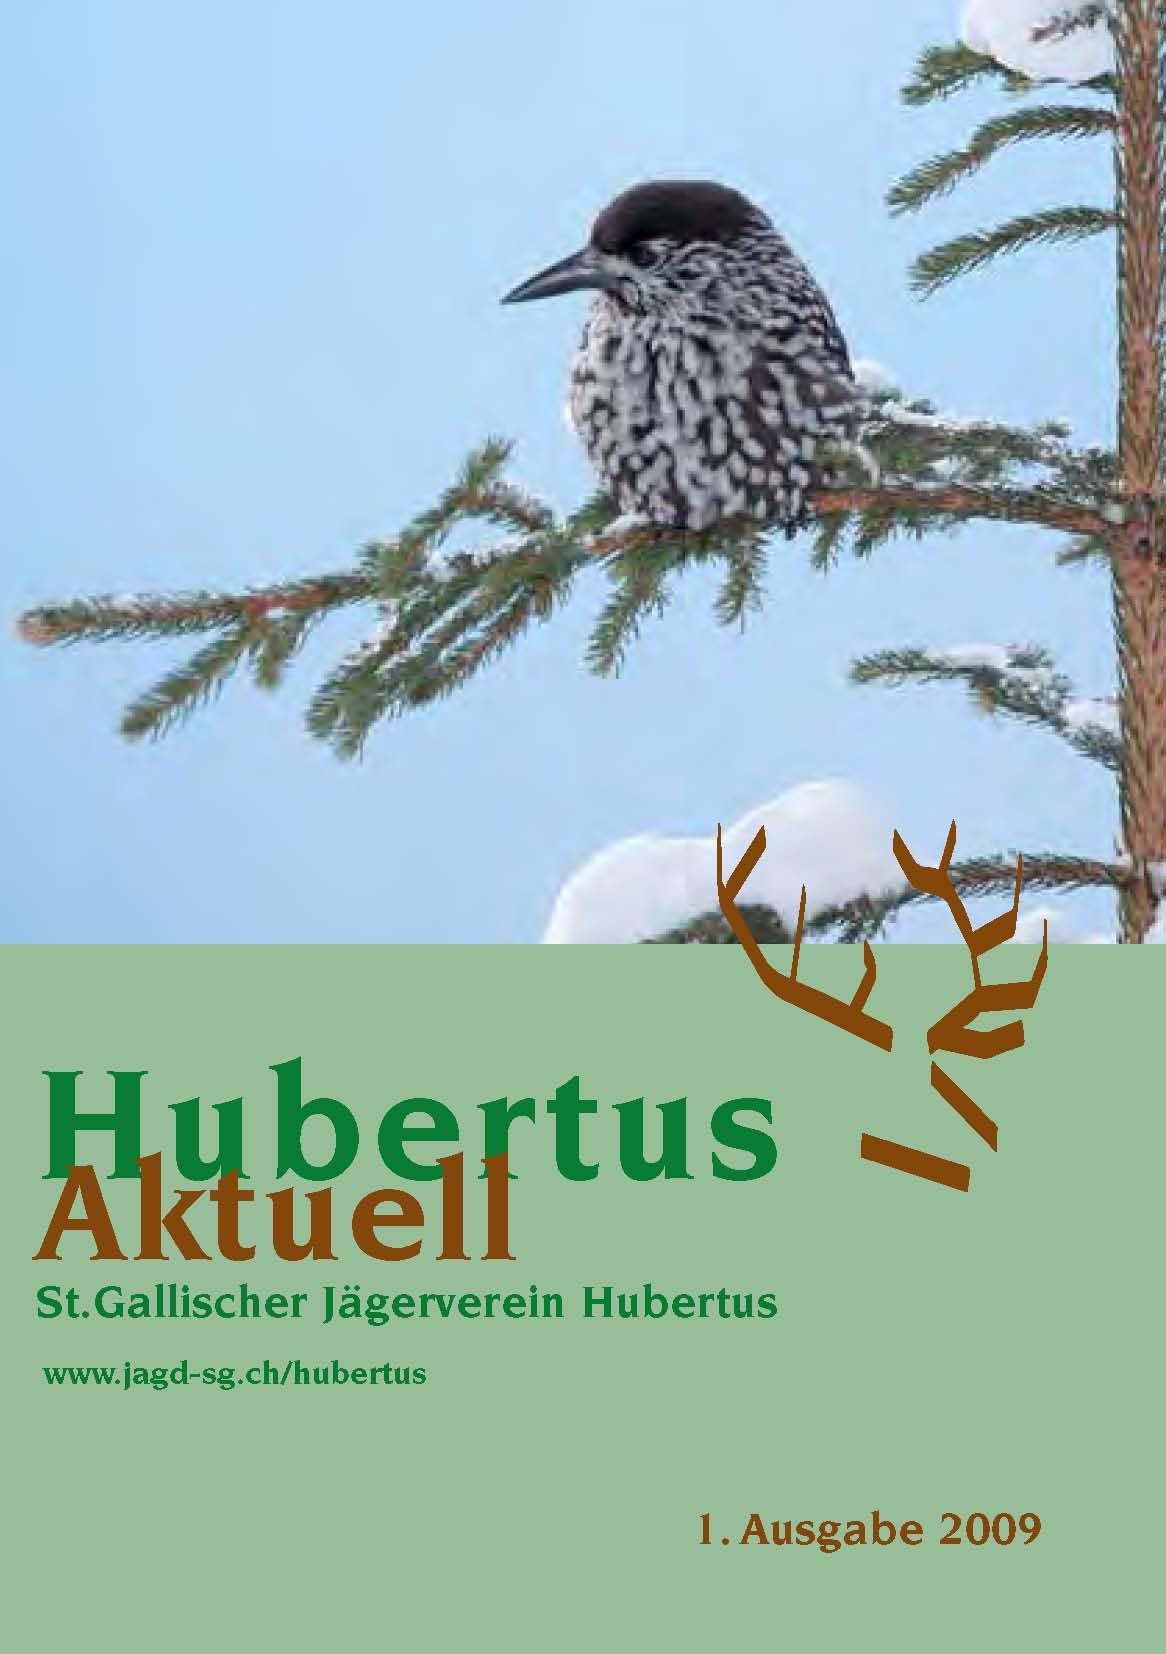 hubertus aktuell 01 2009